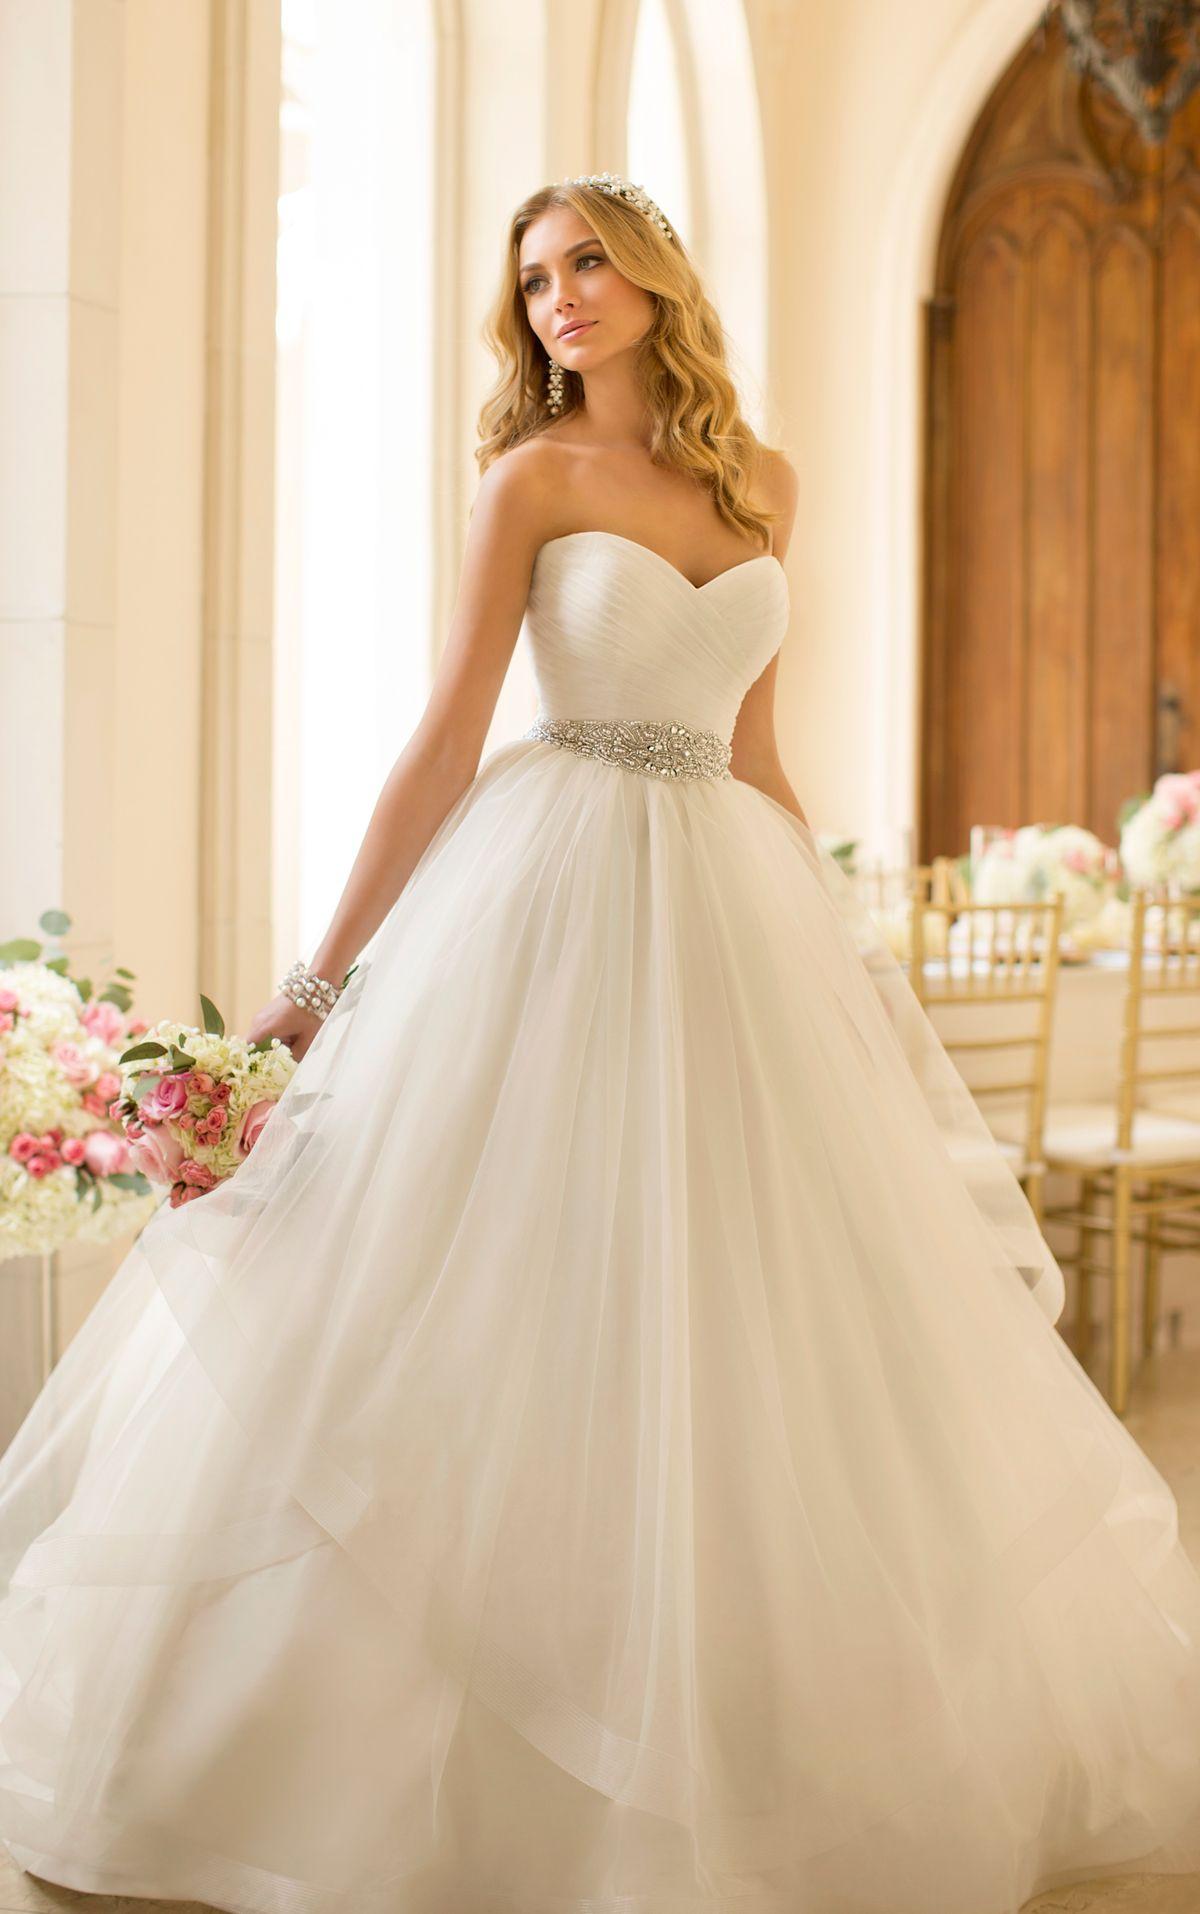 Glamorous Stella York Wedding Dresses 2014 Collection | Stella york ...